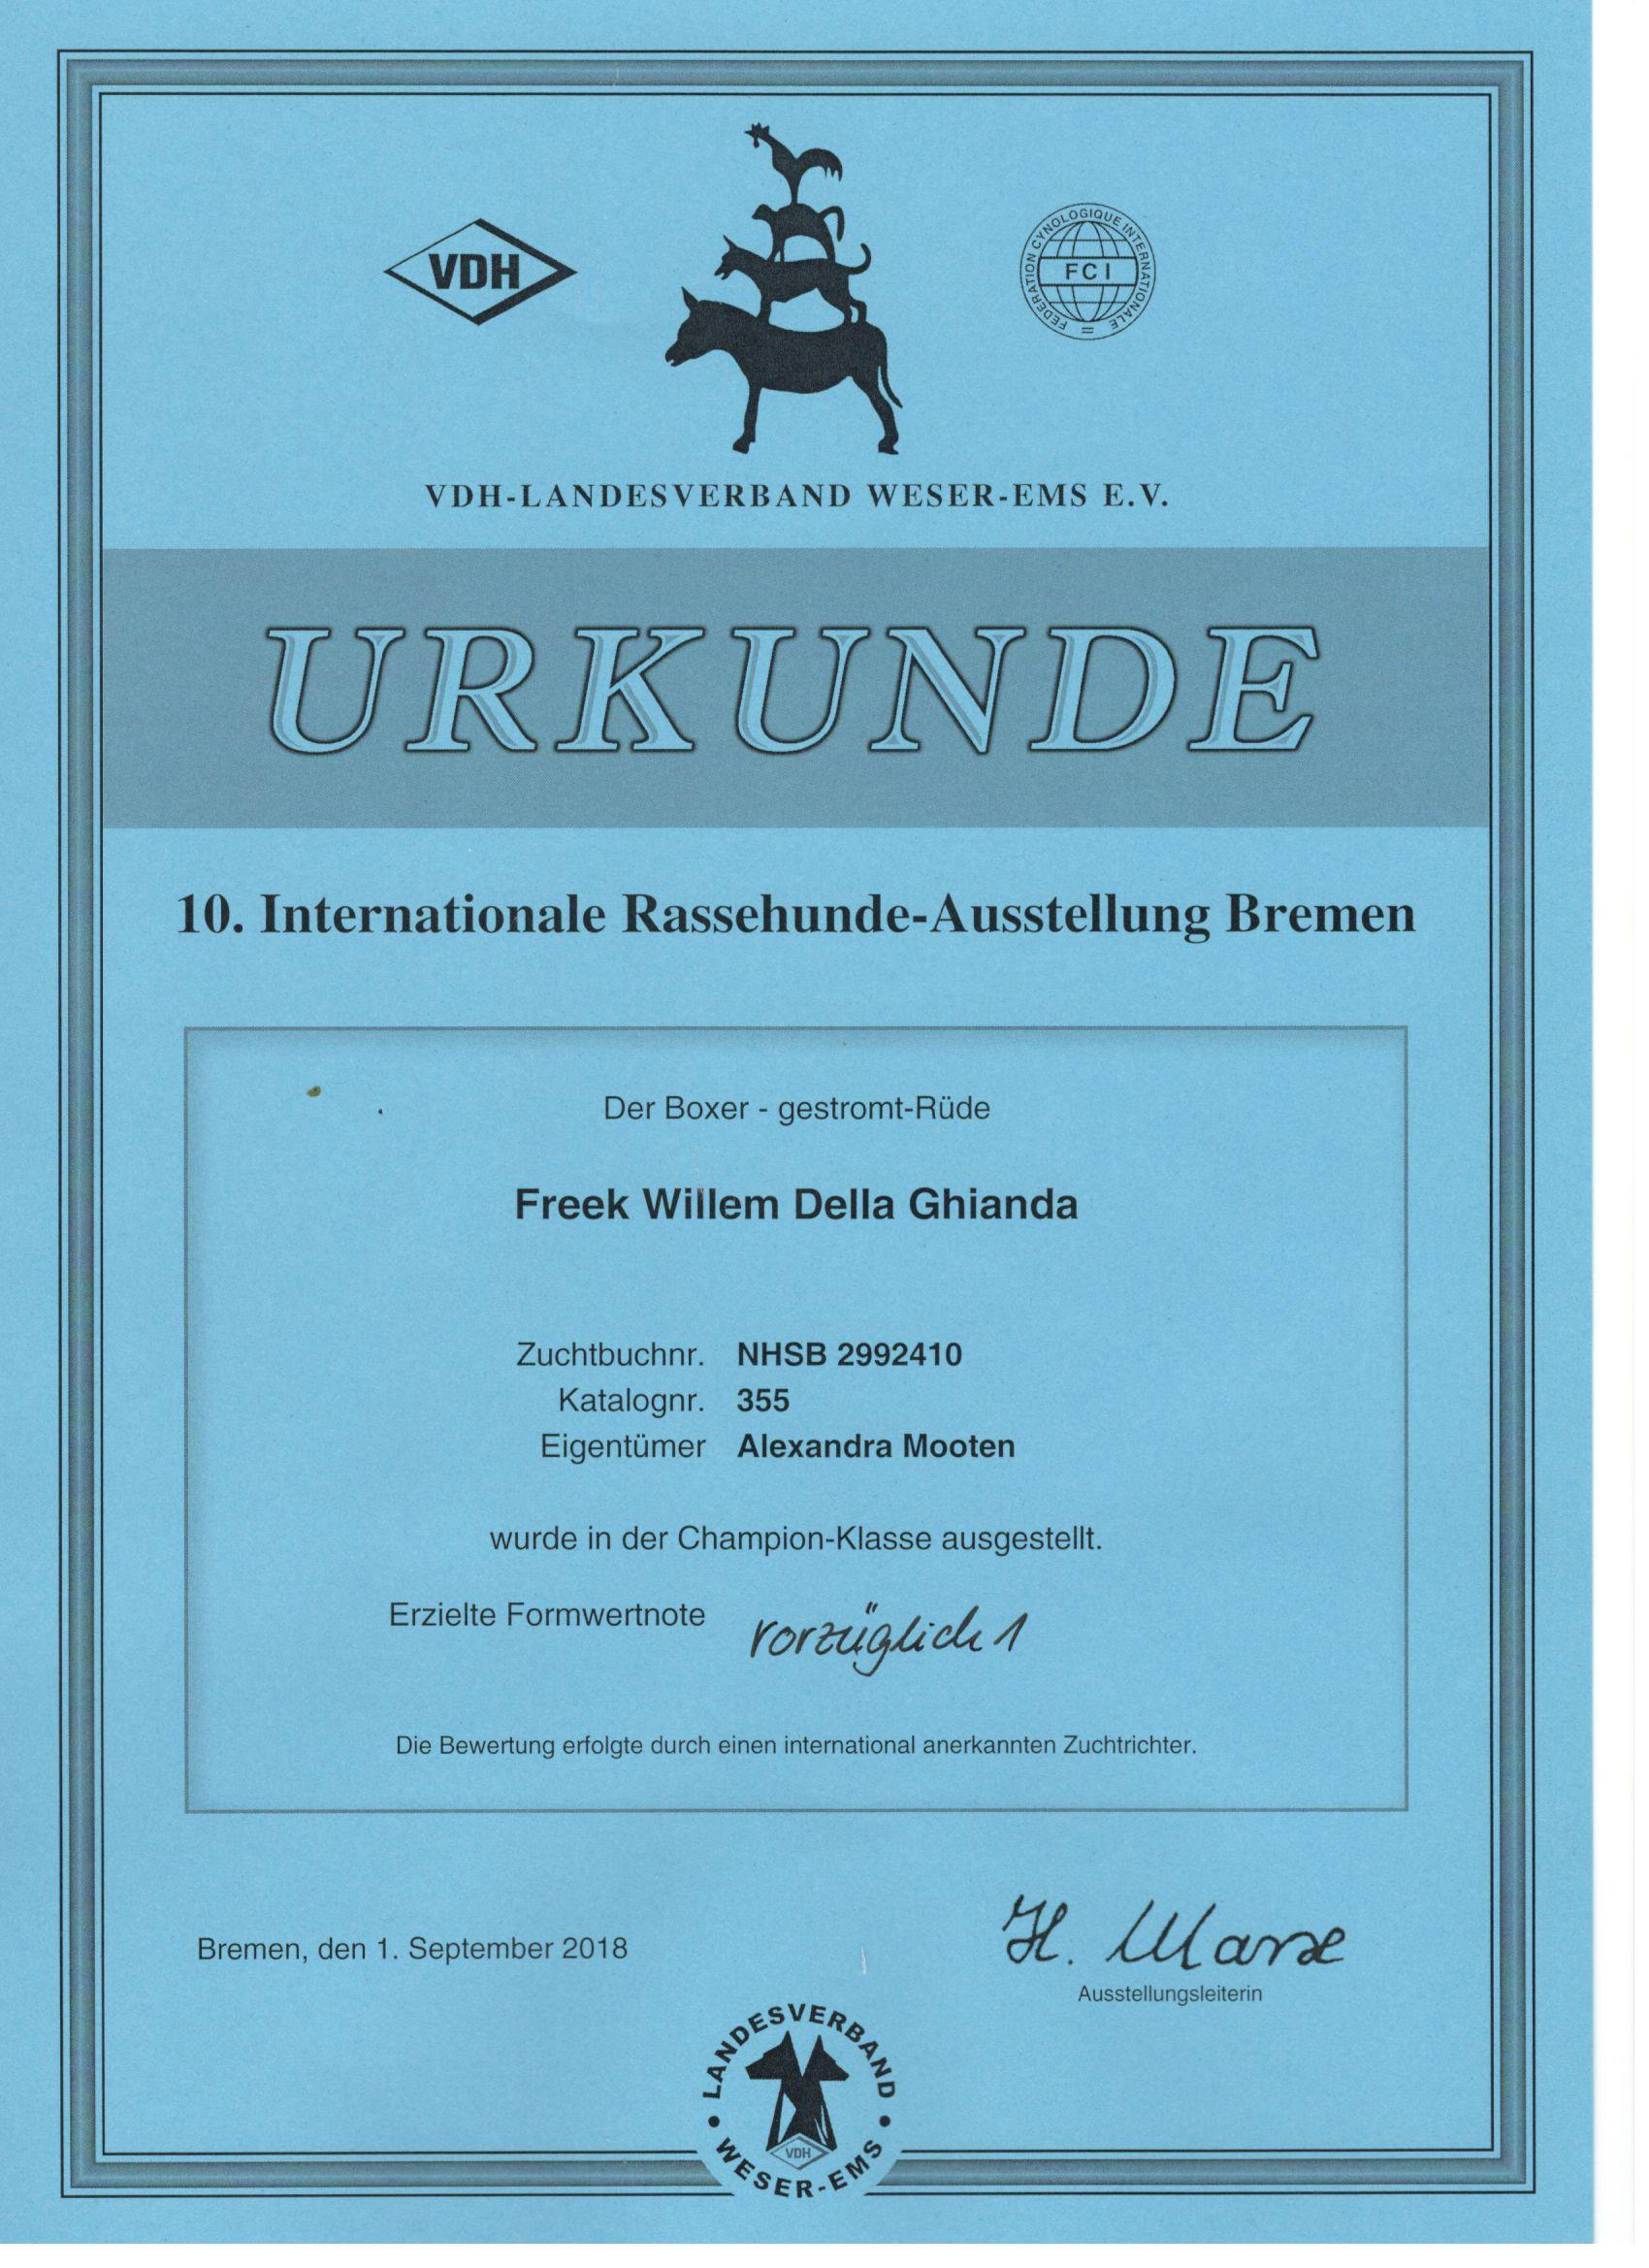 Int. Bremen